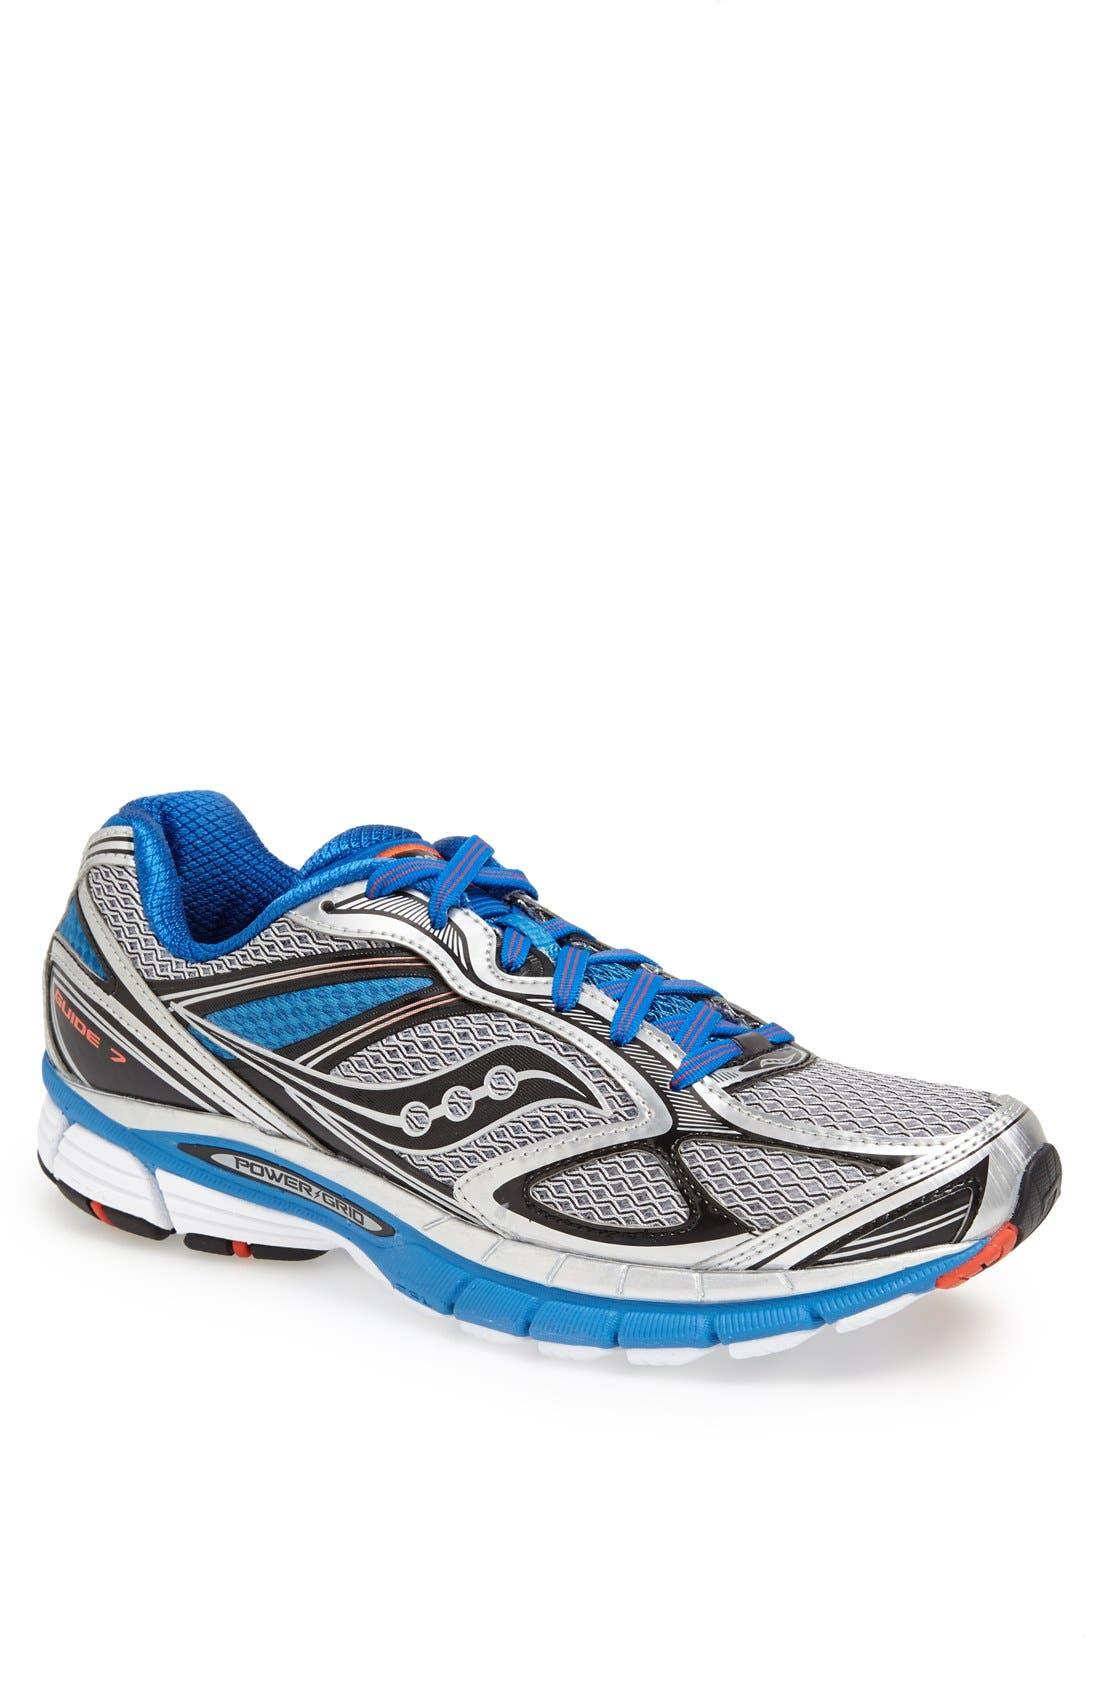 Main Image - Saucony 'Guide 7' Running Shoe (Men)